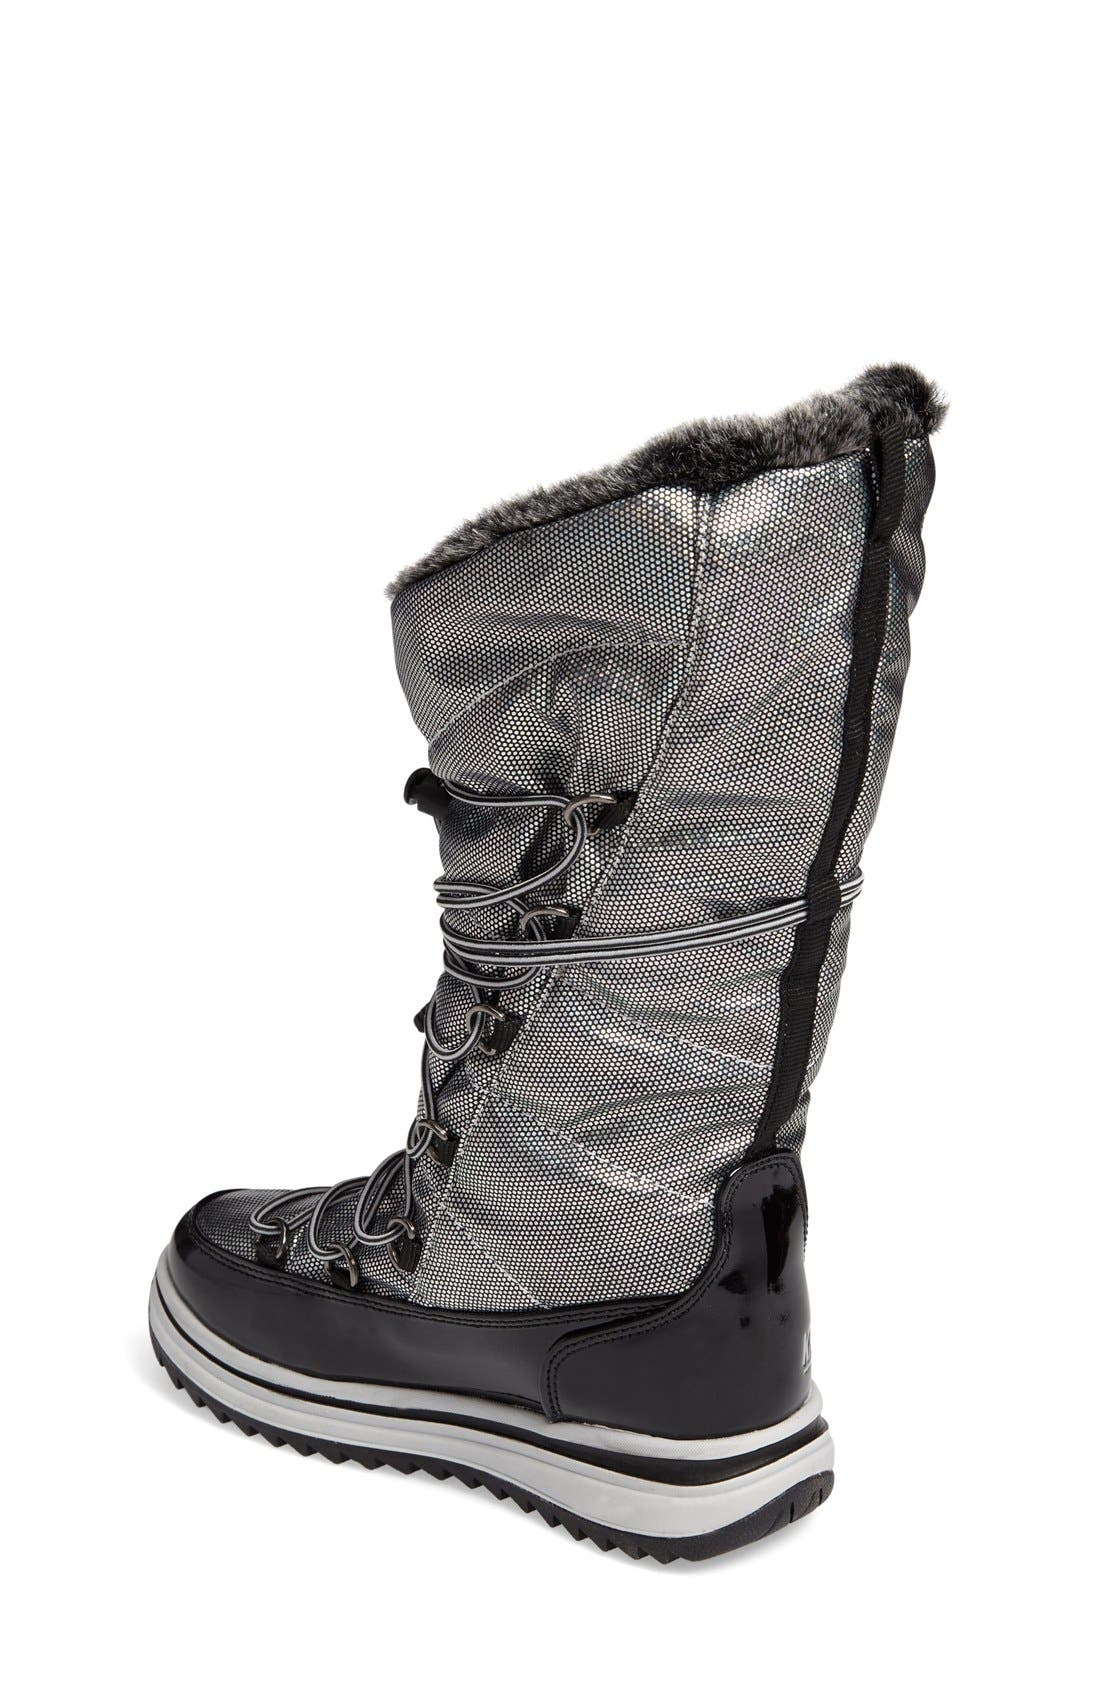 Alternate Image 2  - Khombu Kai Waterproof Insulated Boot (Toddler, Little Kid & Big Kid)